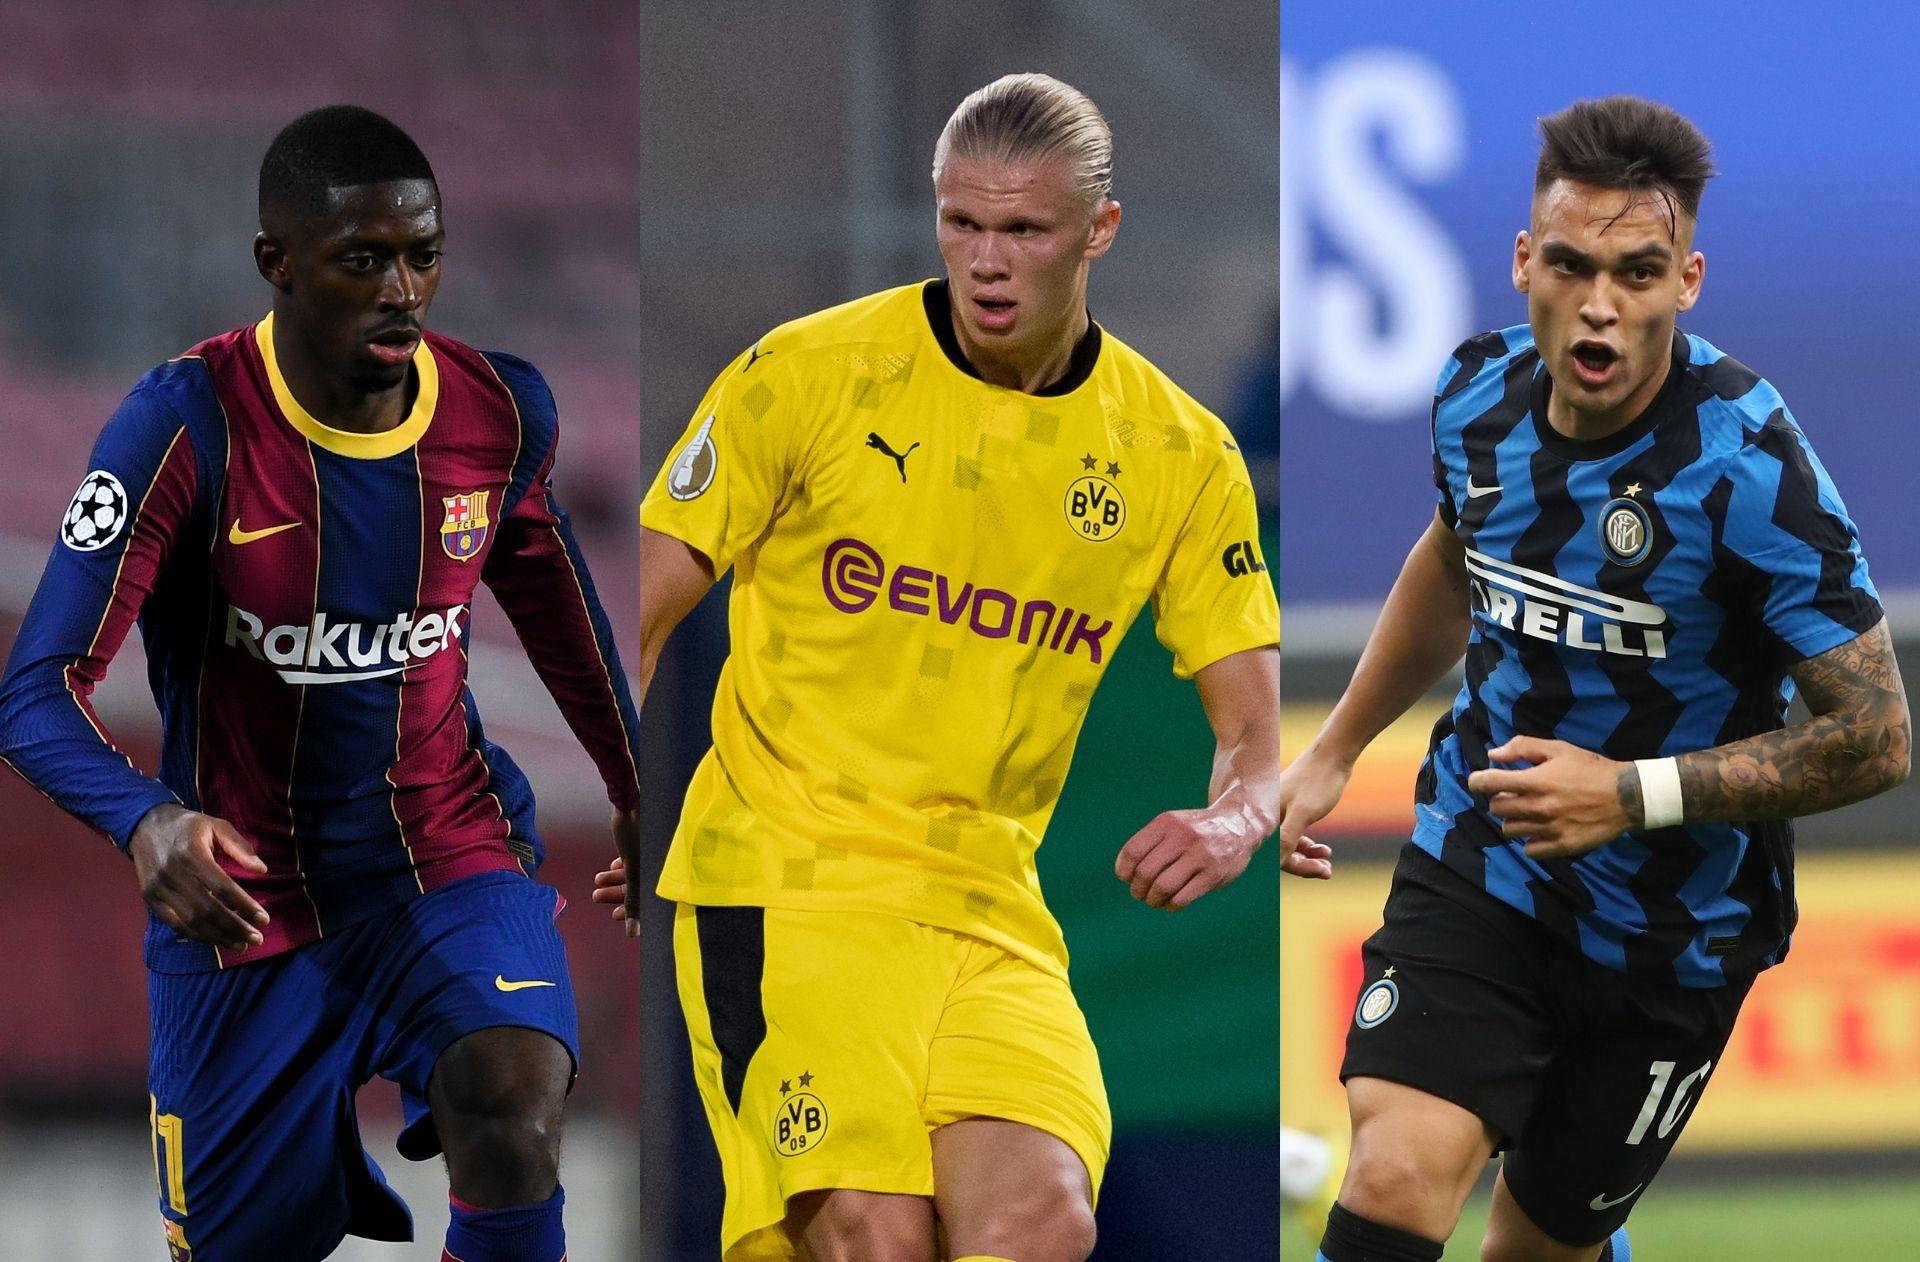 Ousmane Dembele - Barcelona, Erling Haaland - Dortmund, Lautaro Martinez - Inter